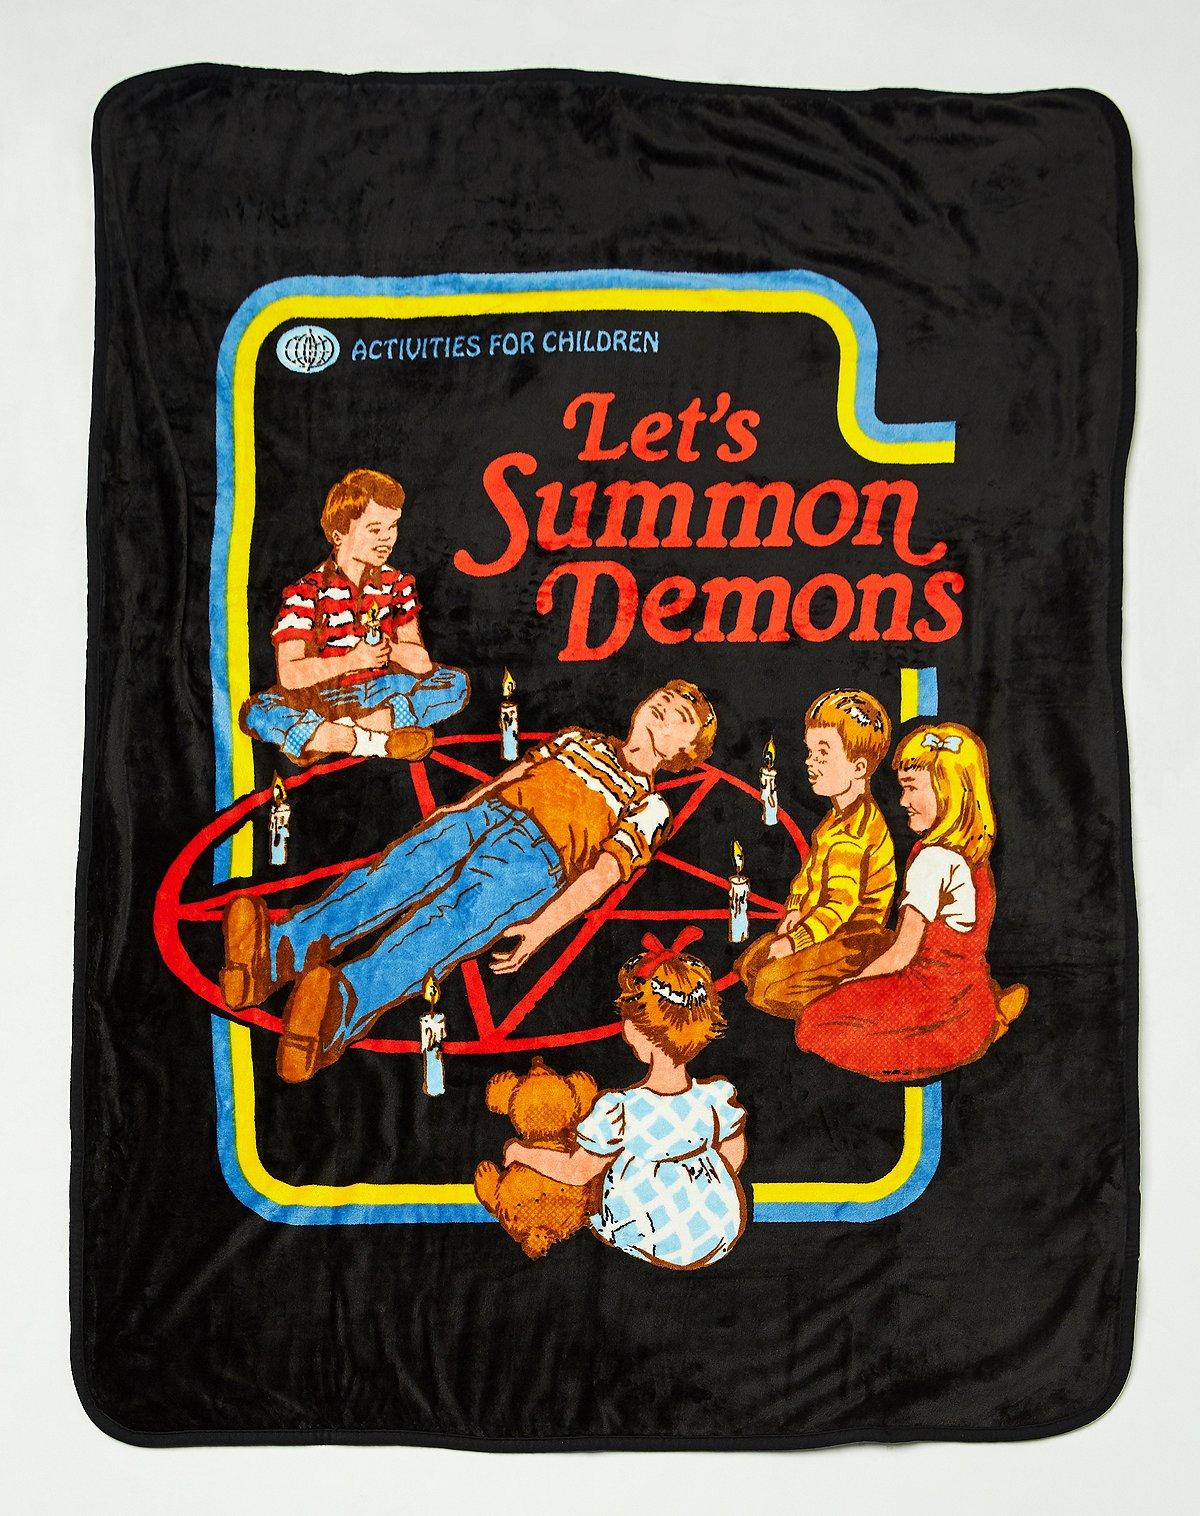 steven rhodes let's summon demons fleece blanket